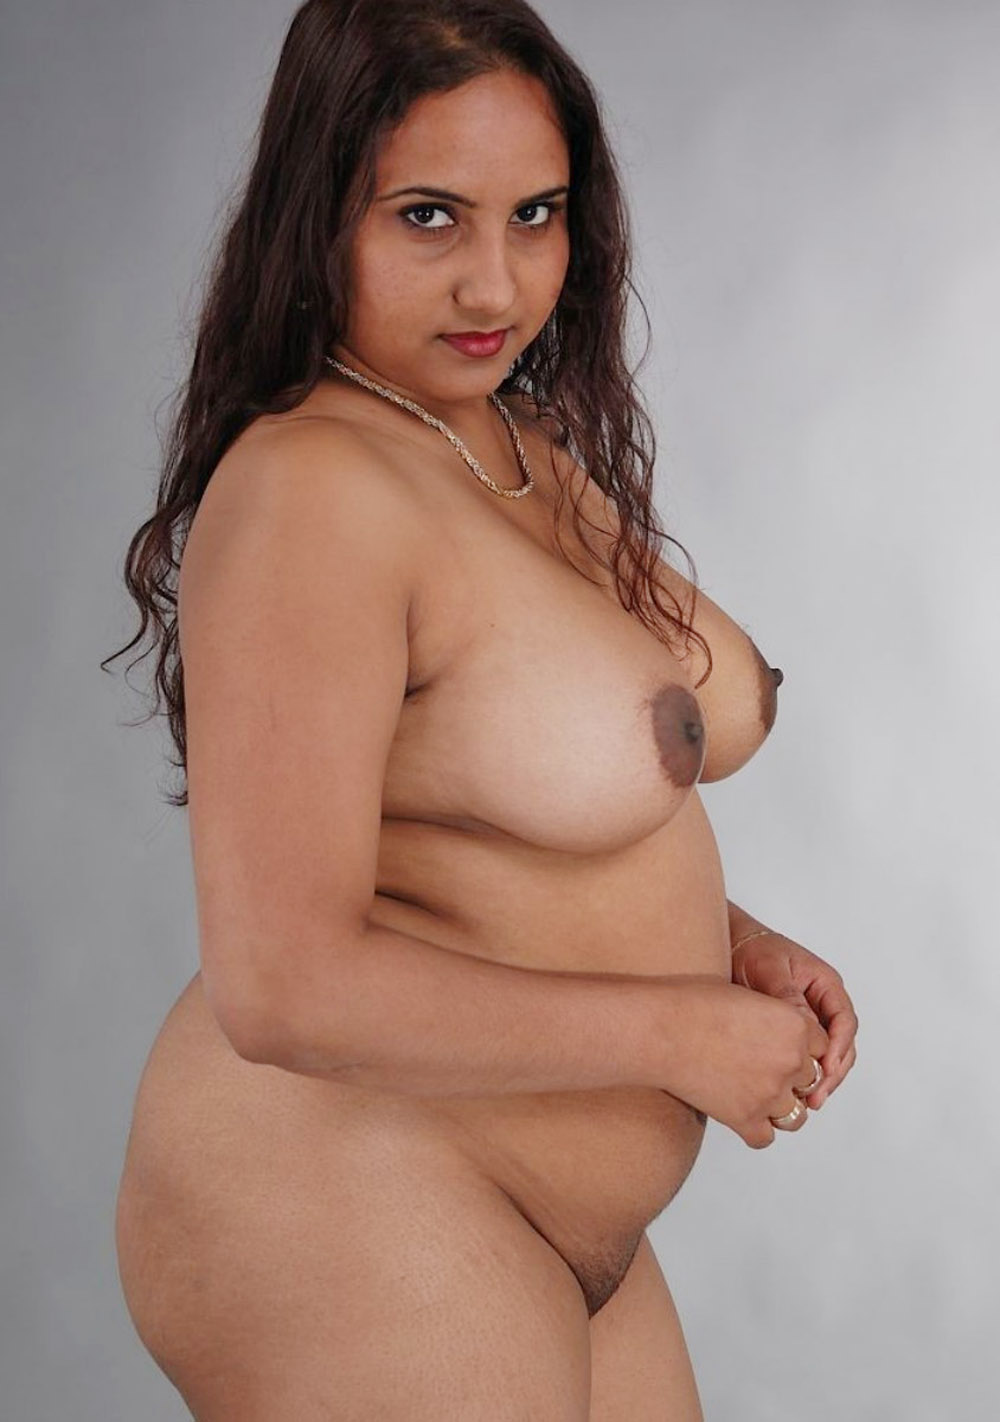 Pornpics of pakistani girls pussy